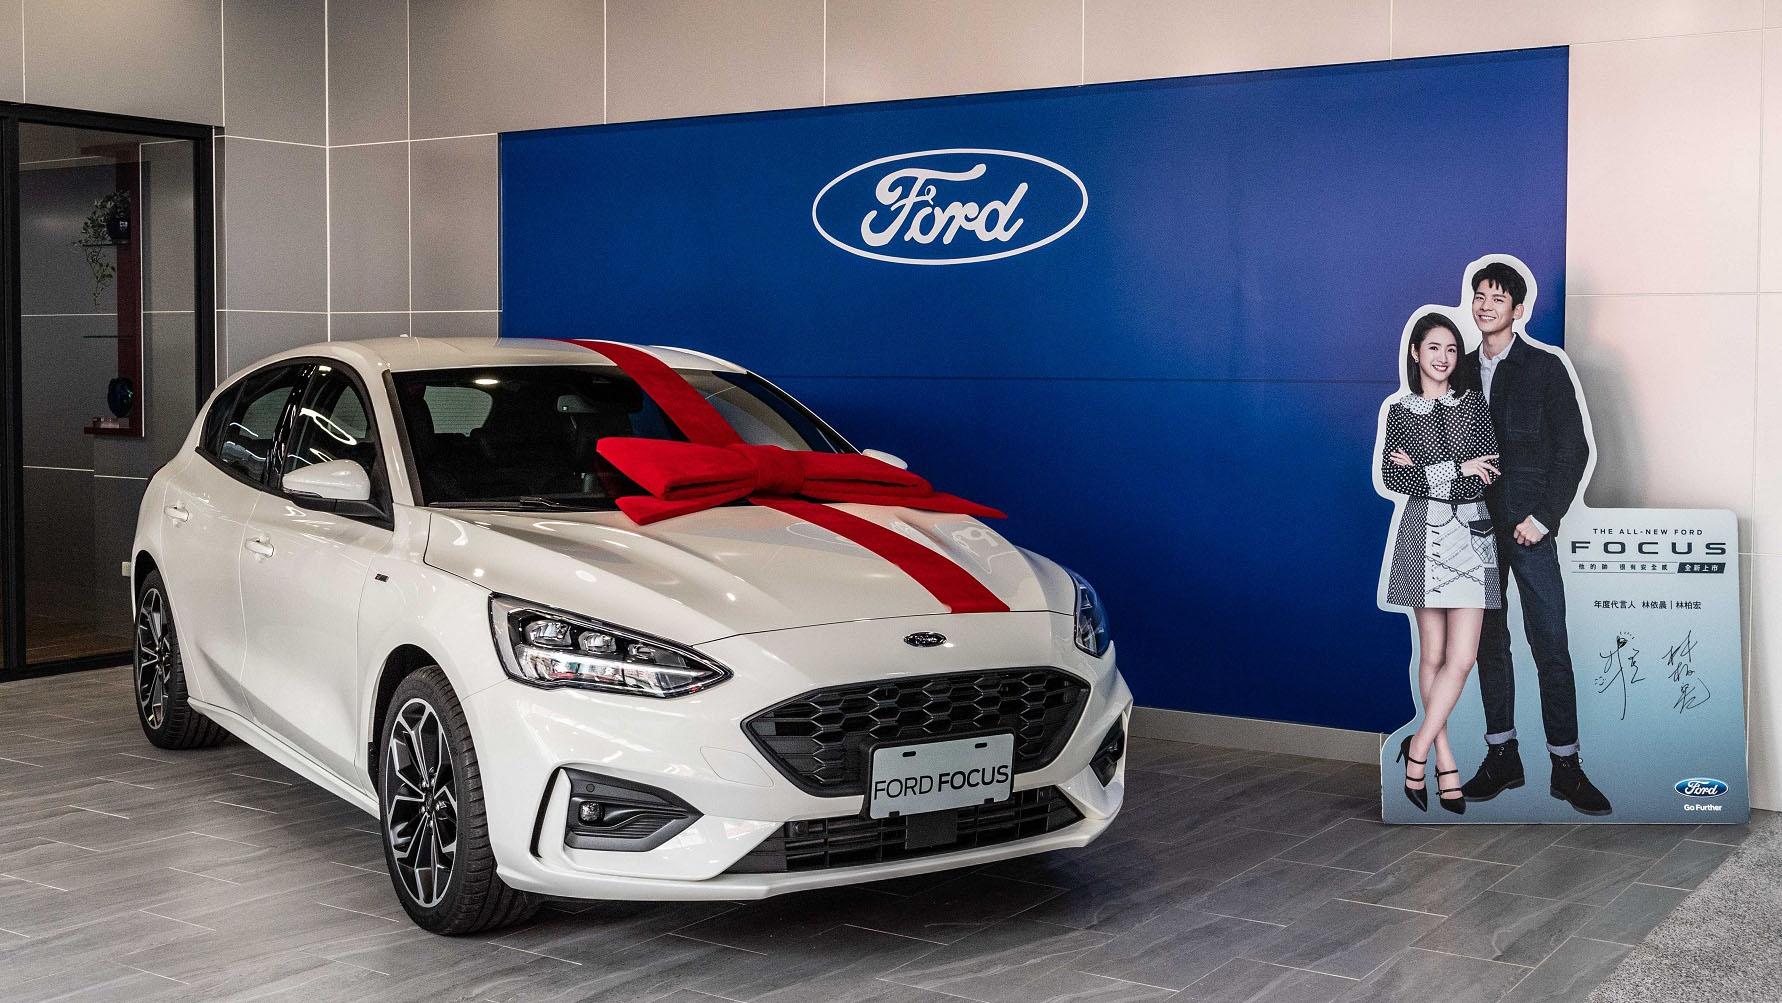 Ford 車展期間接單破千輛|Focus ST 幸運得主出爐|新交車打卡送神秘禮